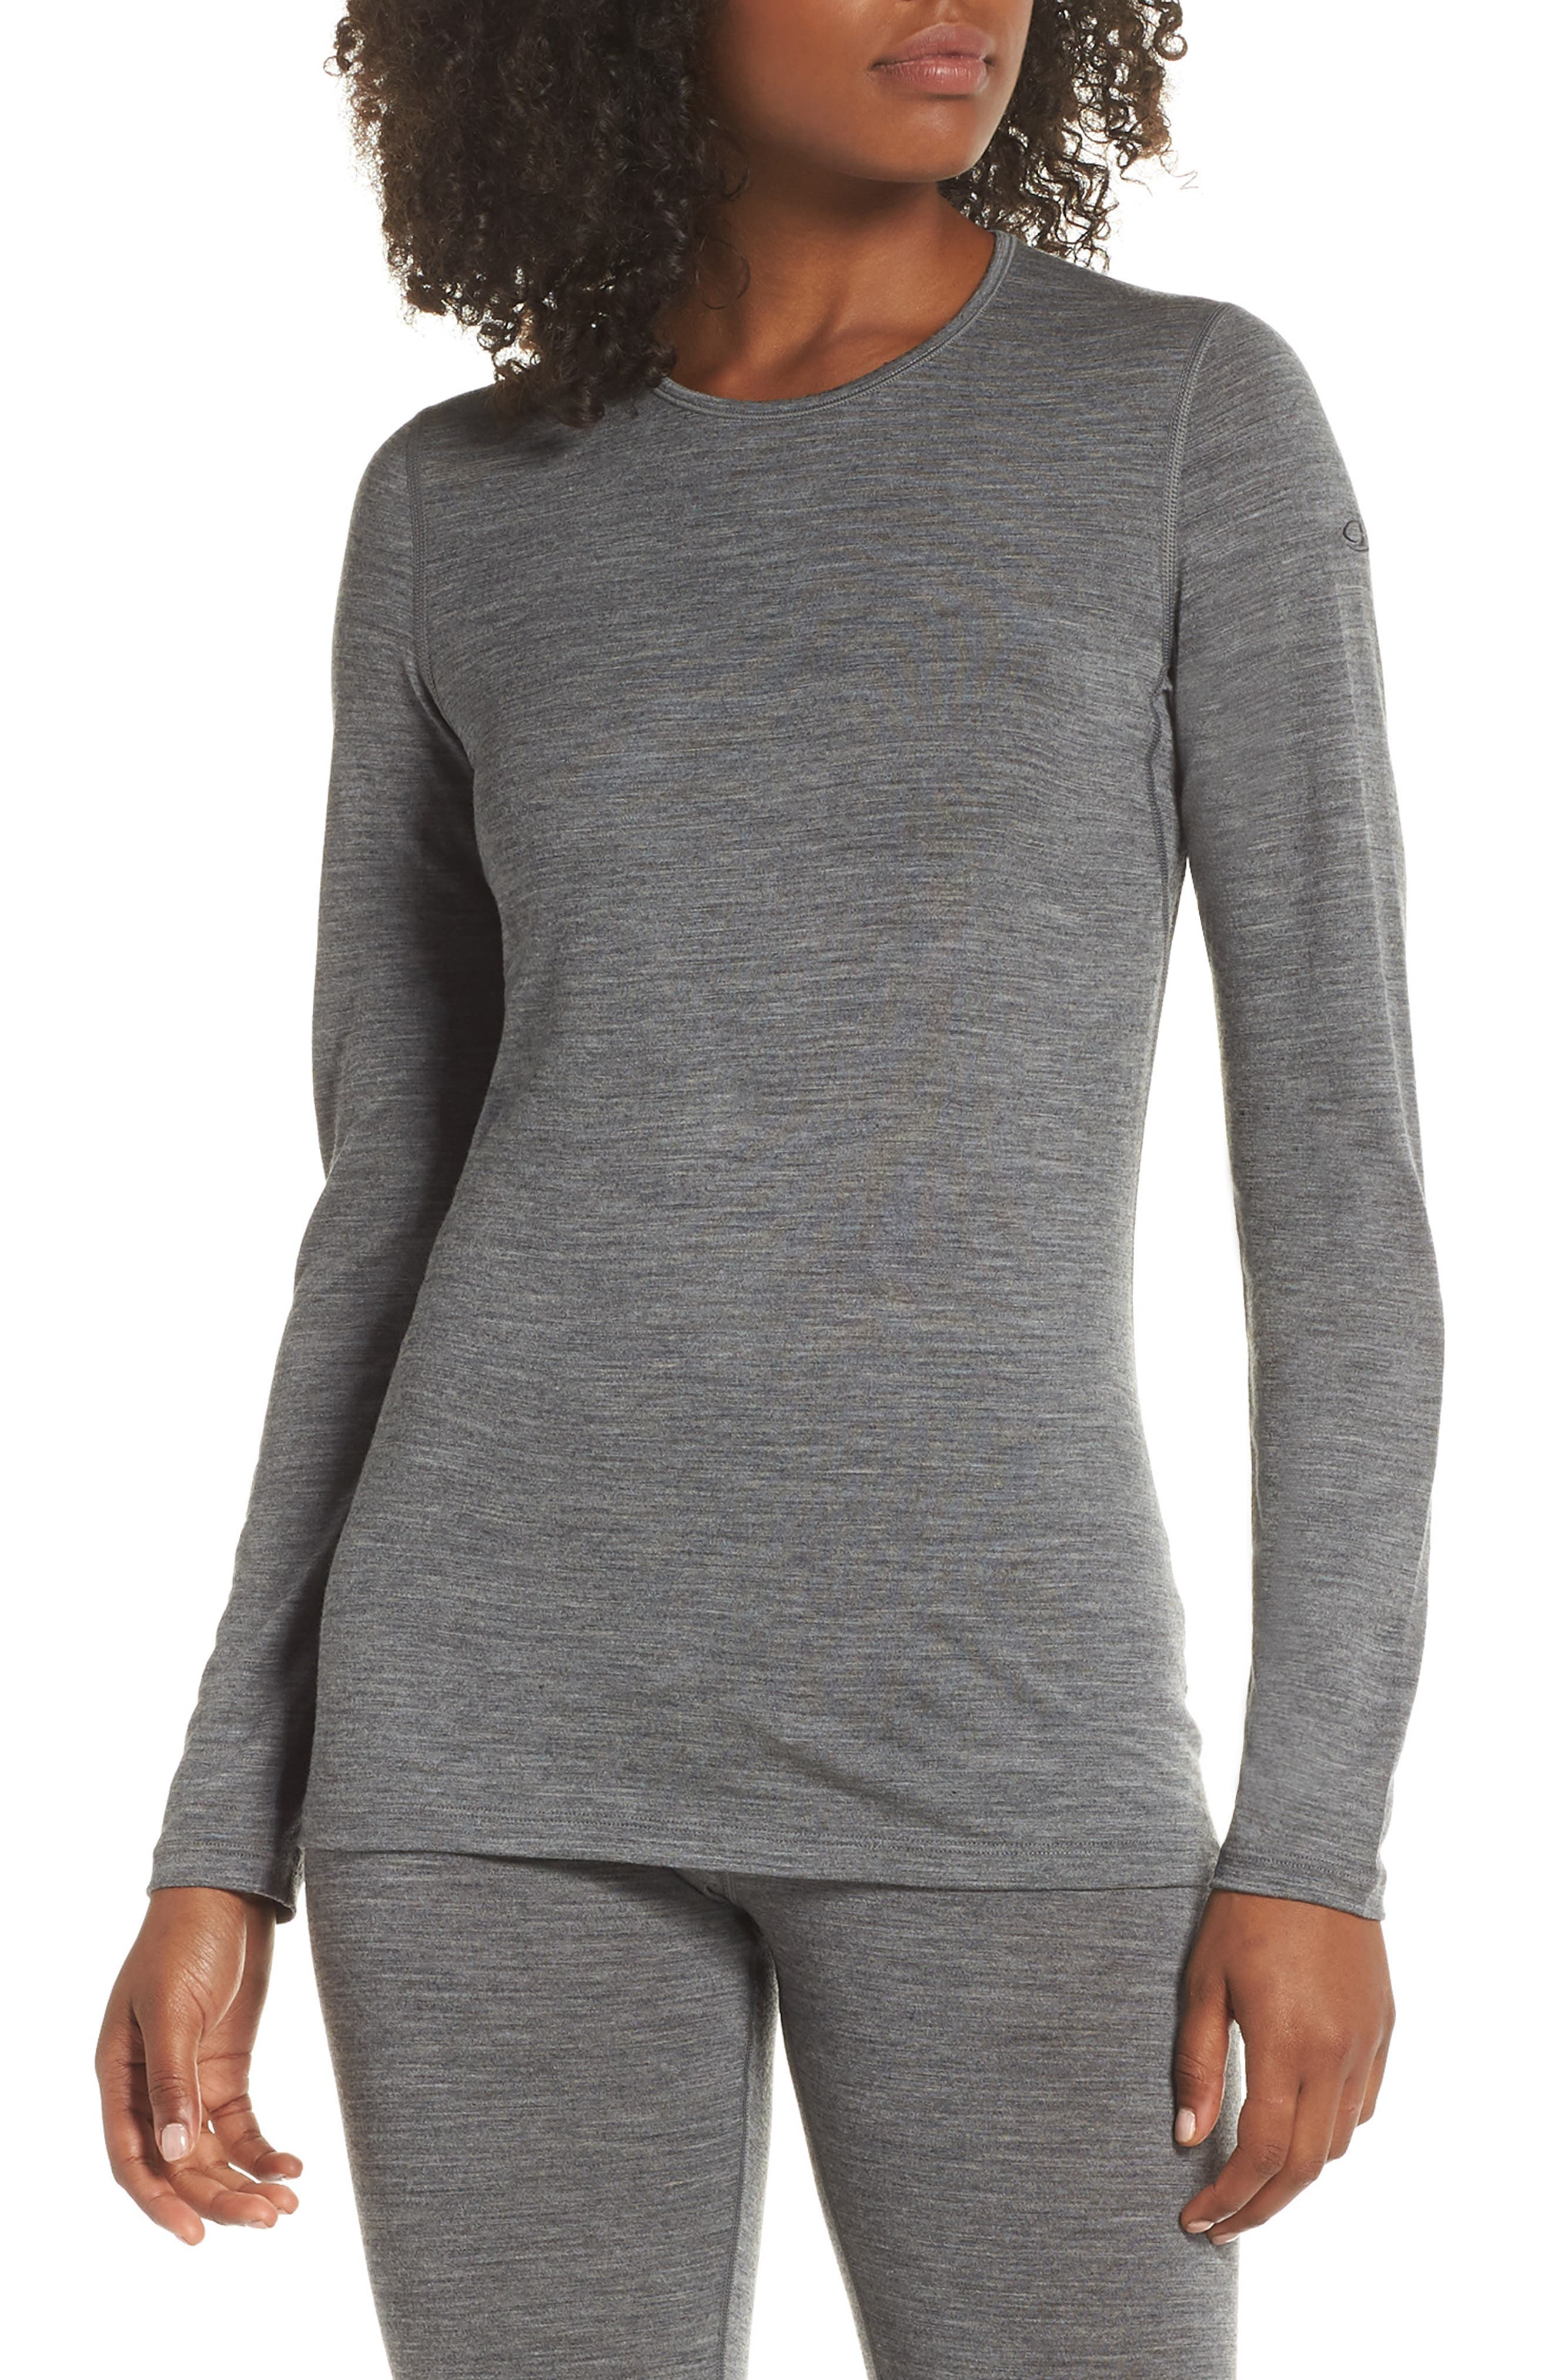 Icebreaker Oasis Long Sleeve Merino Wool Base Layer Tee, Grey